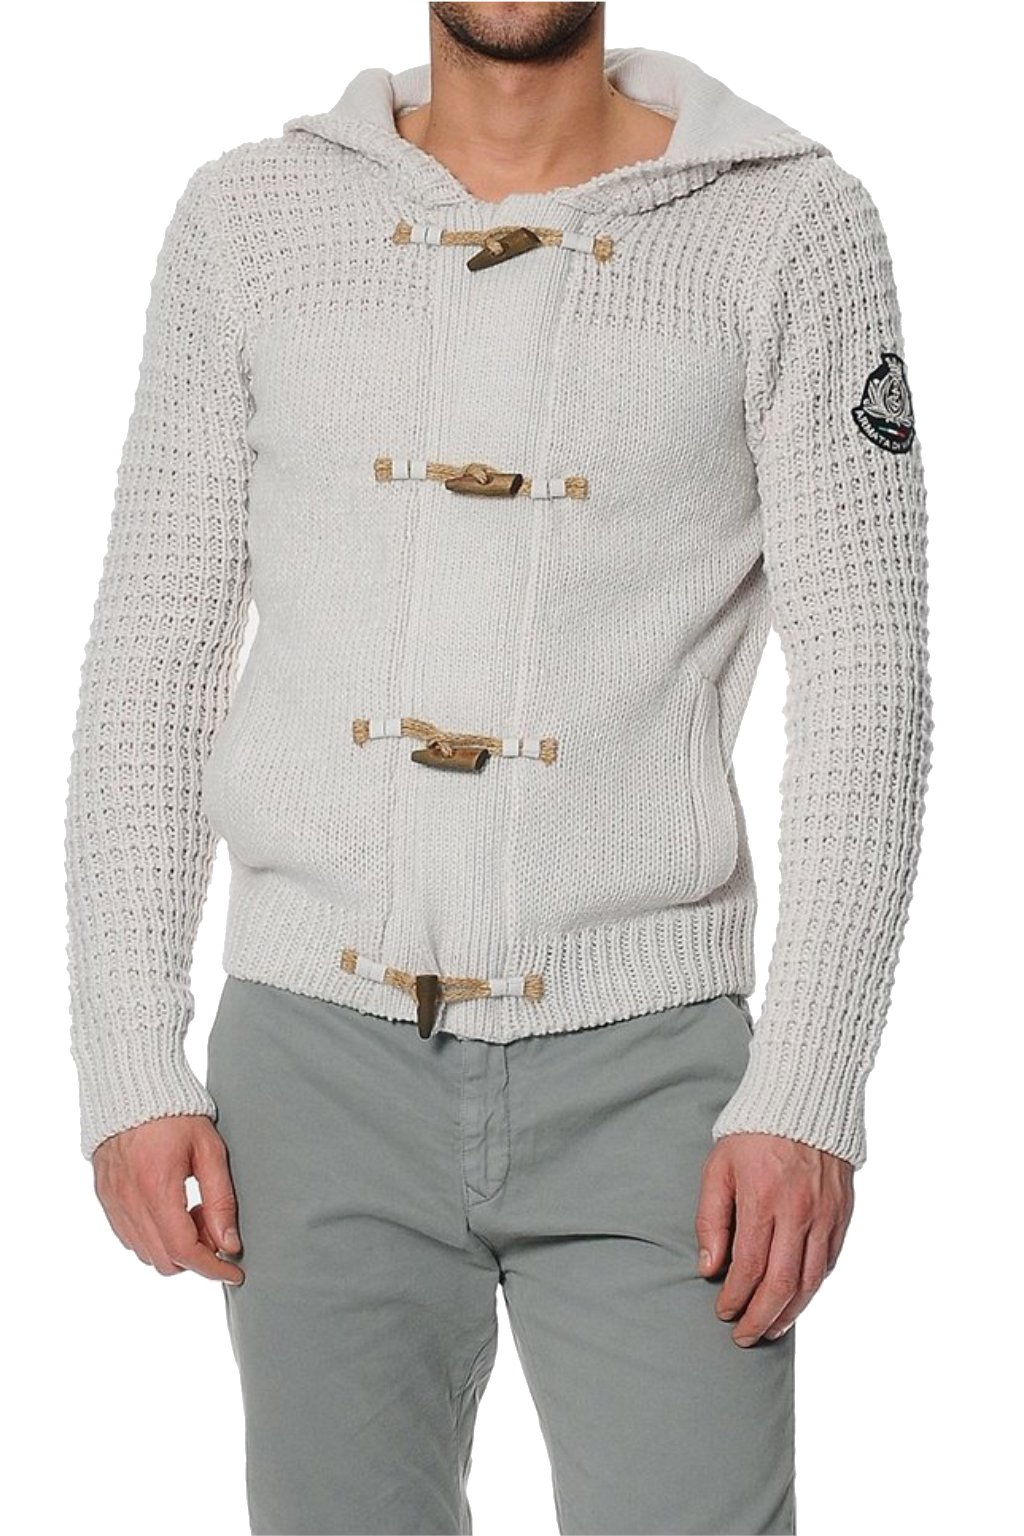 Znackovy pansky vlneny svetr s kapuci bezovy 1